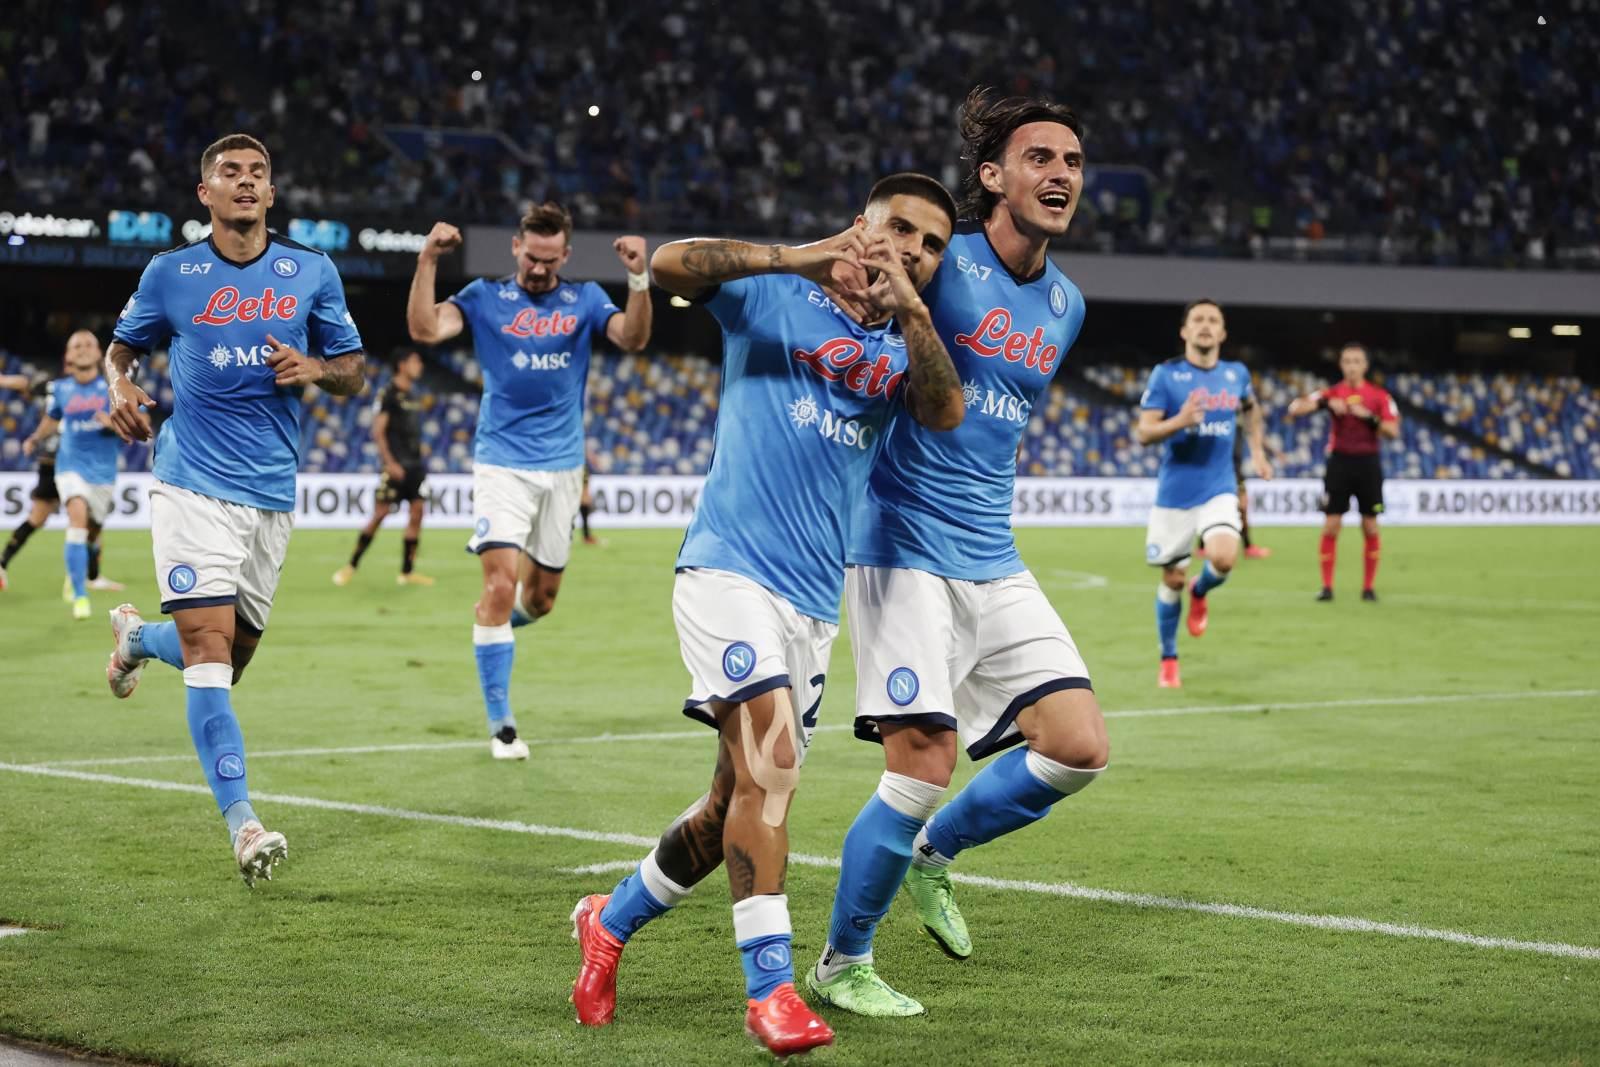 «Наполи» - «Кальяри»: прогноз на матч чемпионата Италии - 26 сентября 2021